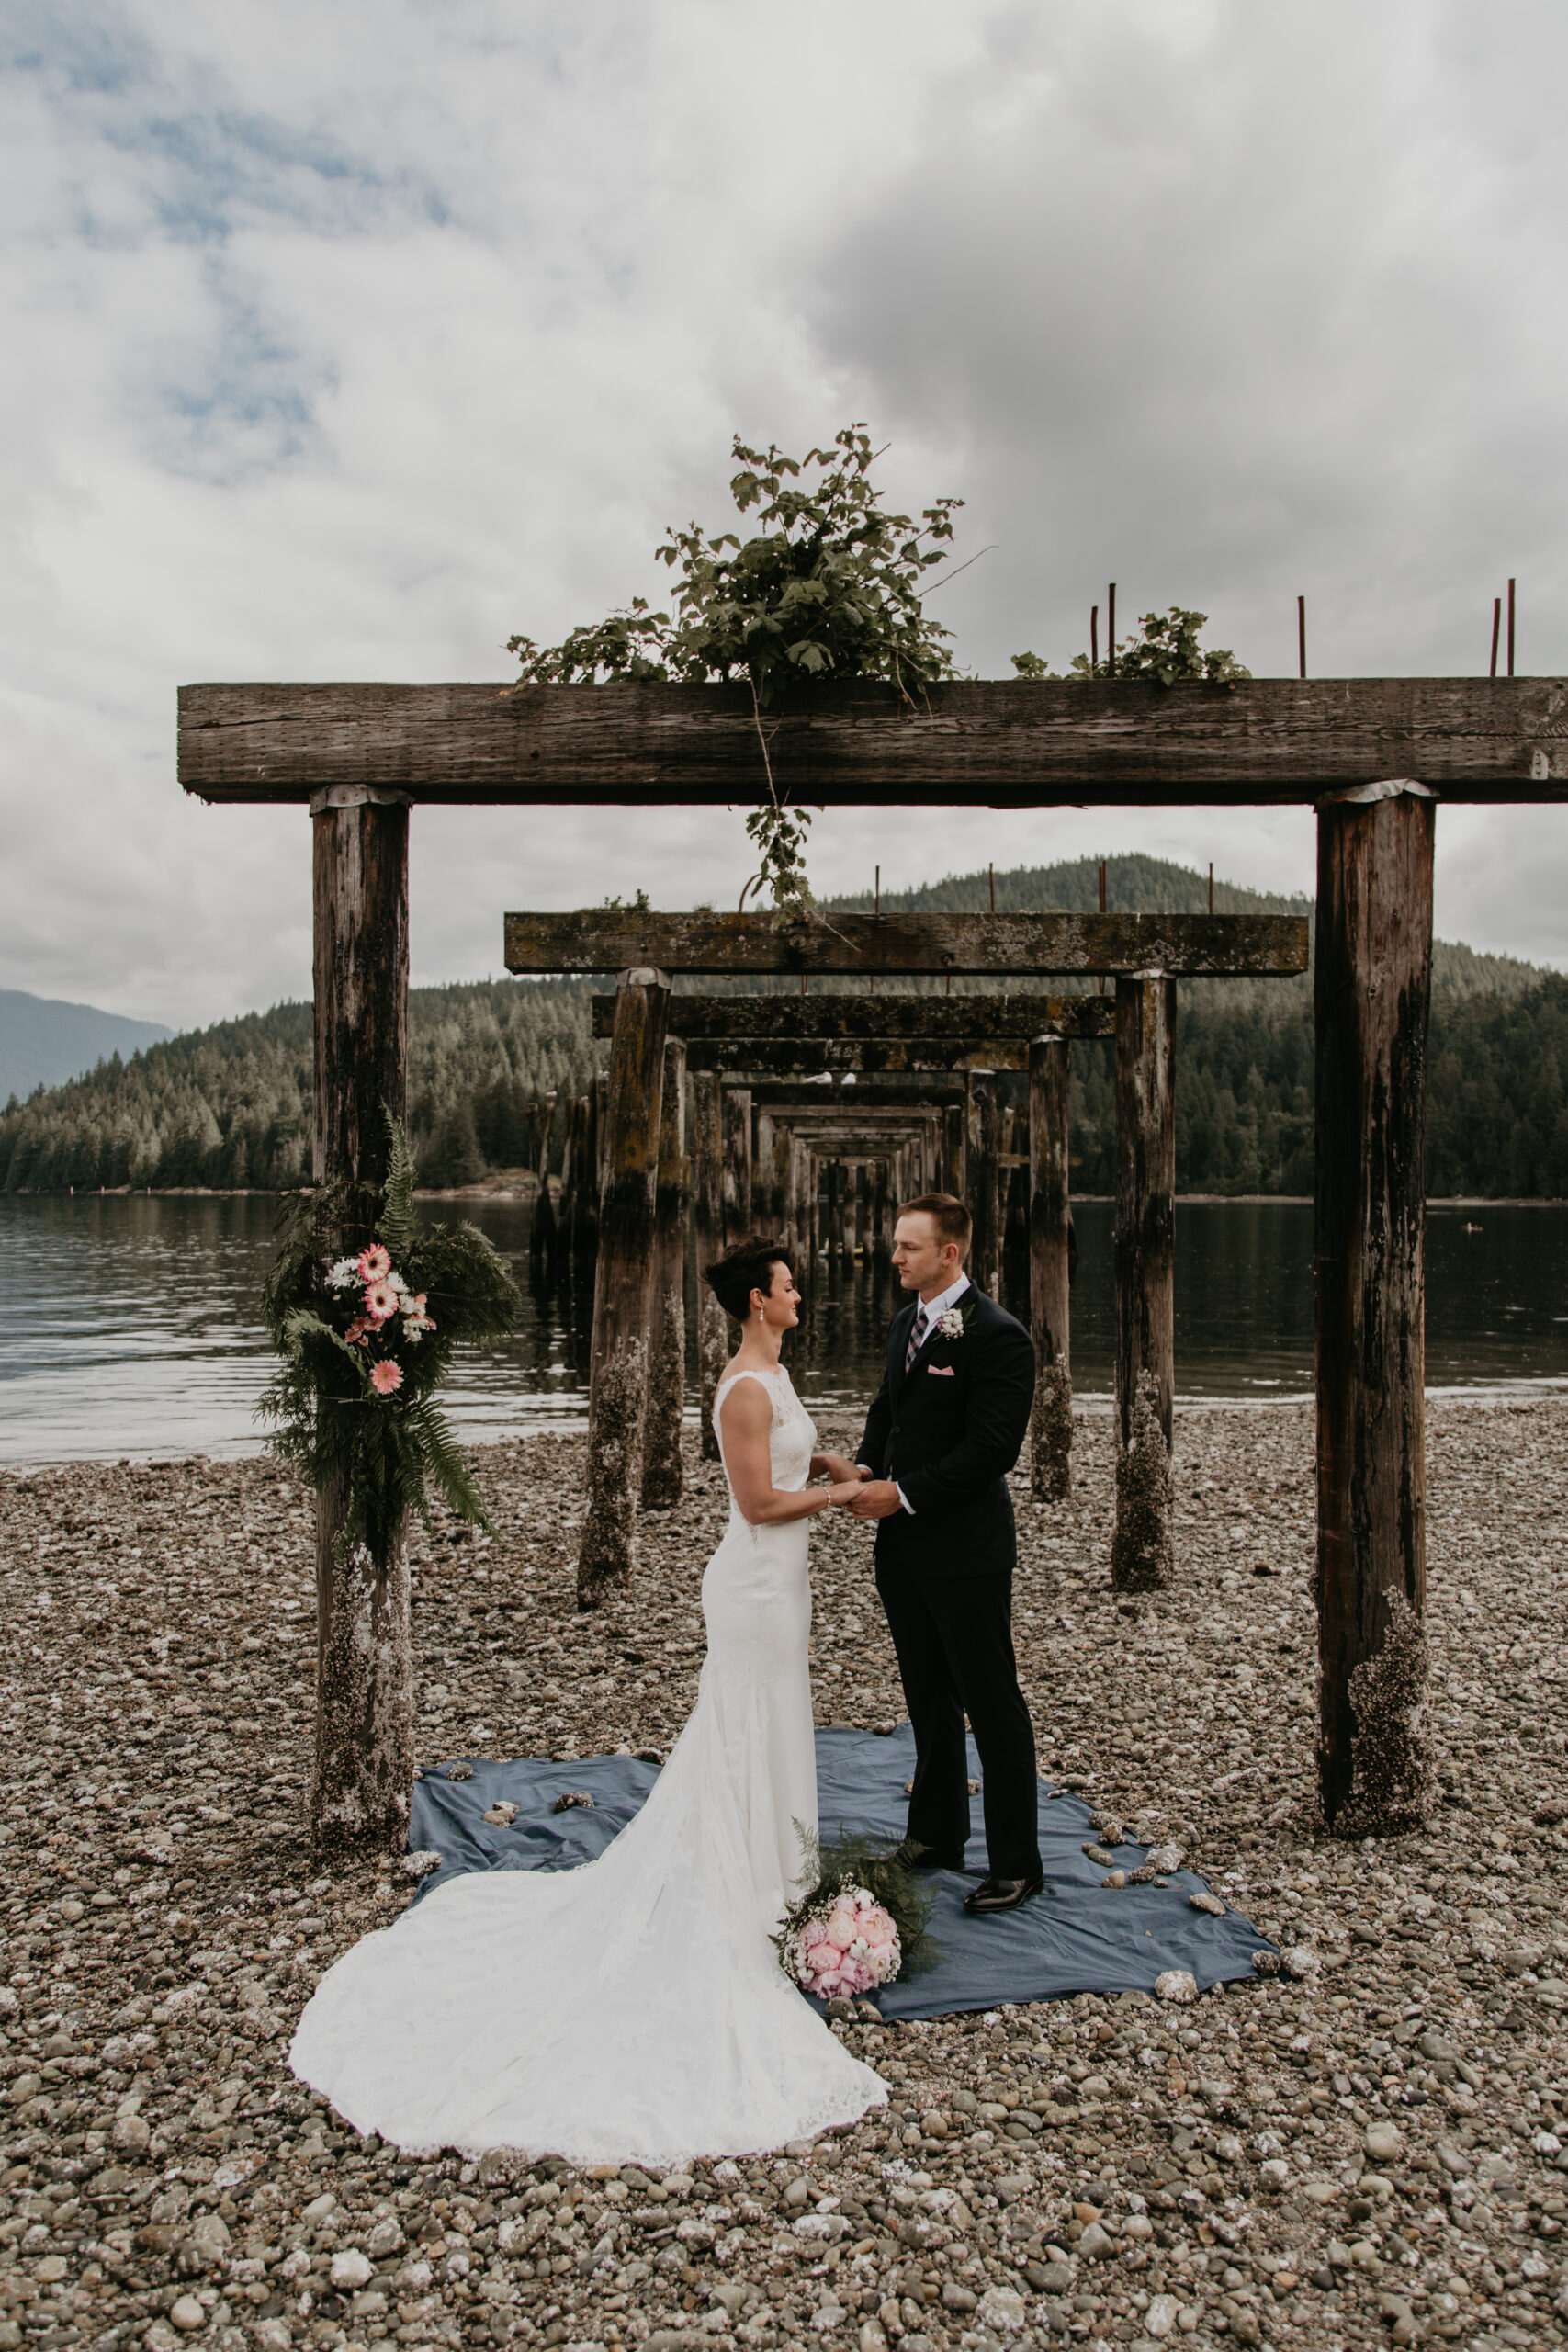 Vancouver elopement at Barnet Marine Park